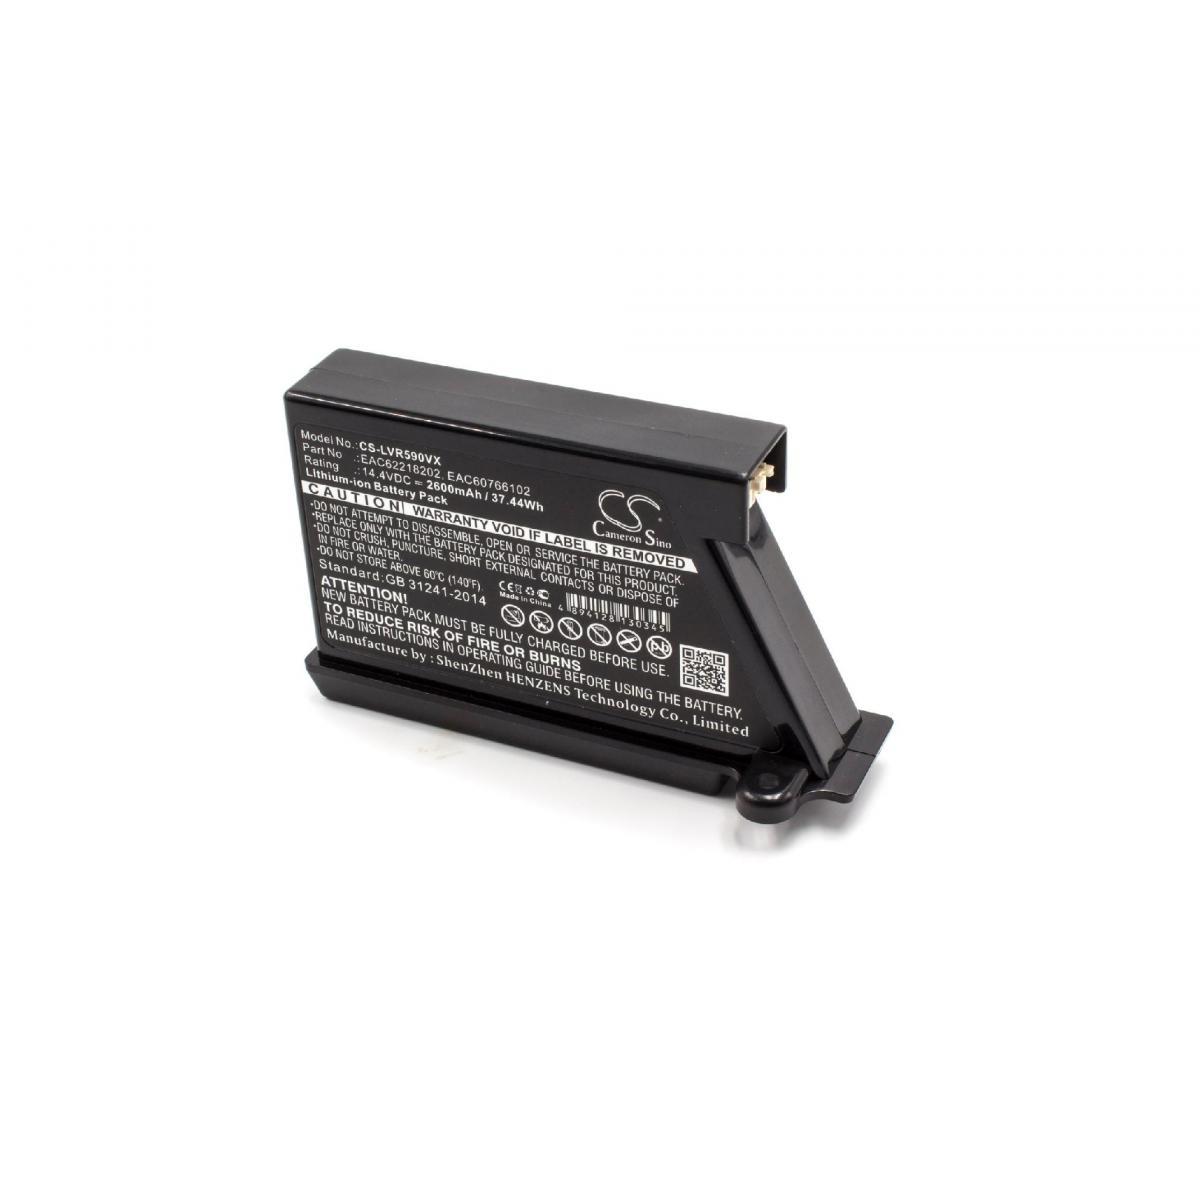 Vhbw vhbw Batterie compatible avec LG HOM-BOT Square, Turbo, VR1229RB, VR5001CM robot électroménager (2600mAh, 14,4V, Li-ion)